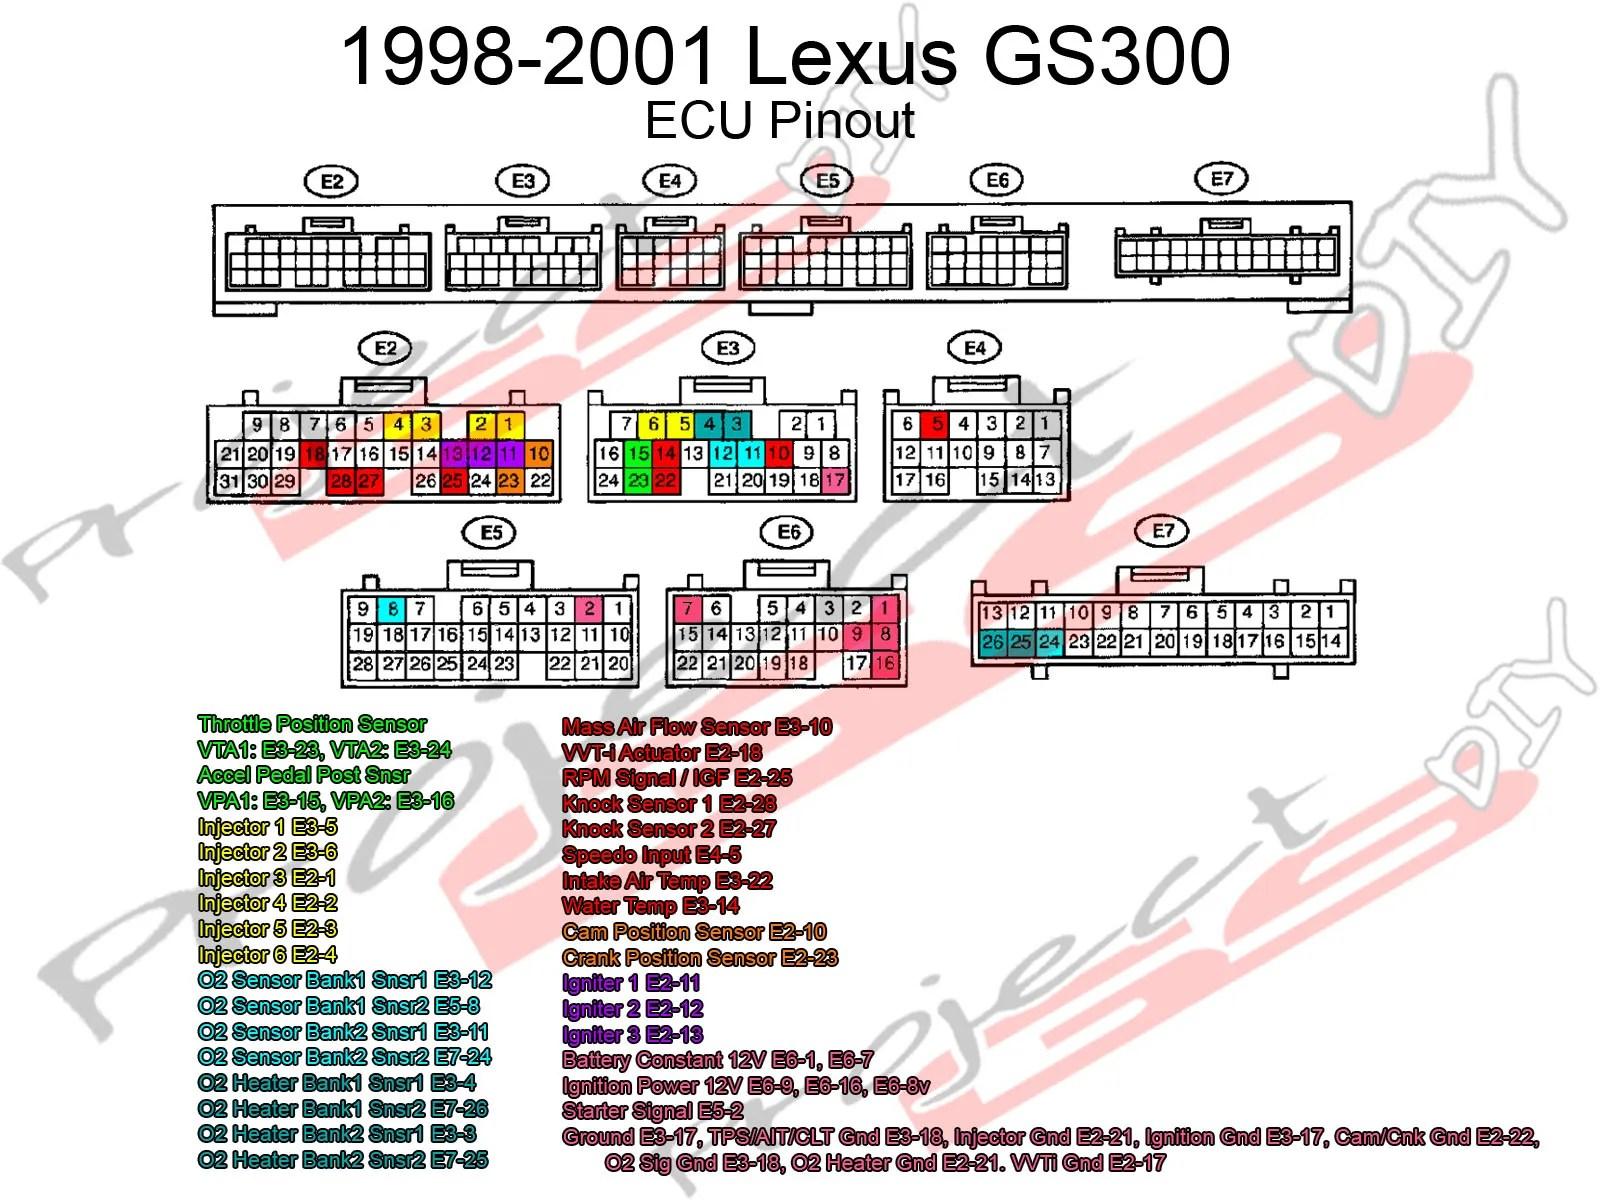 hight resolution of 377531d1452434848 lexus gs300 1998 be rev limiter wiring gs3 98 01 1999 lexus gs300 lexus rx330 mark levinson wiring diagram